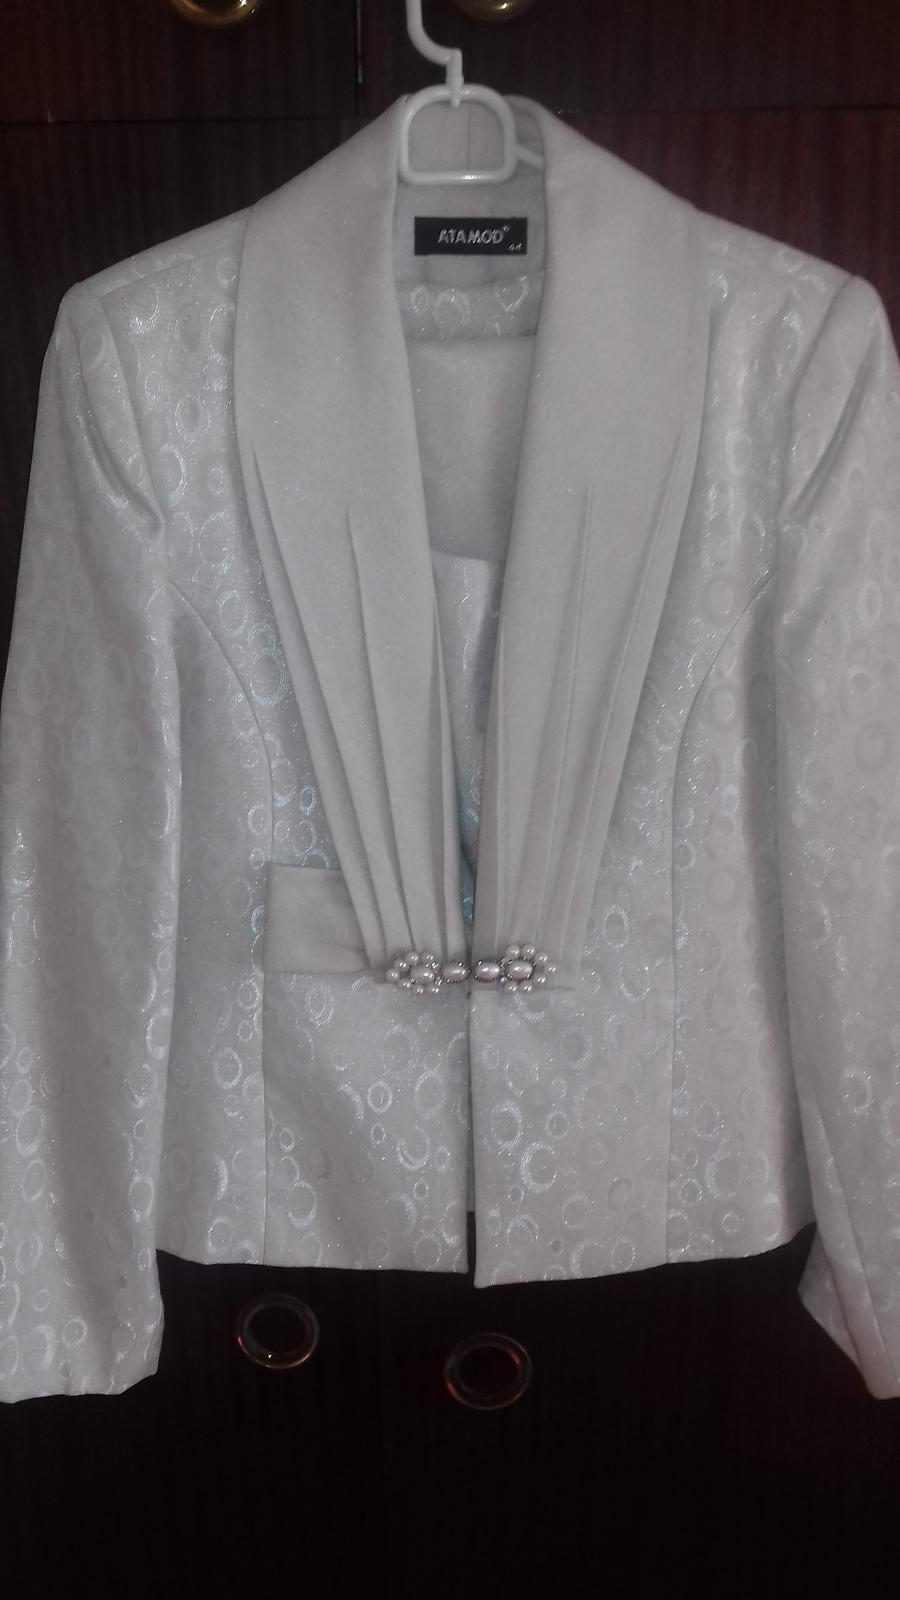 suknovy kostym - Obrázok č. 1